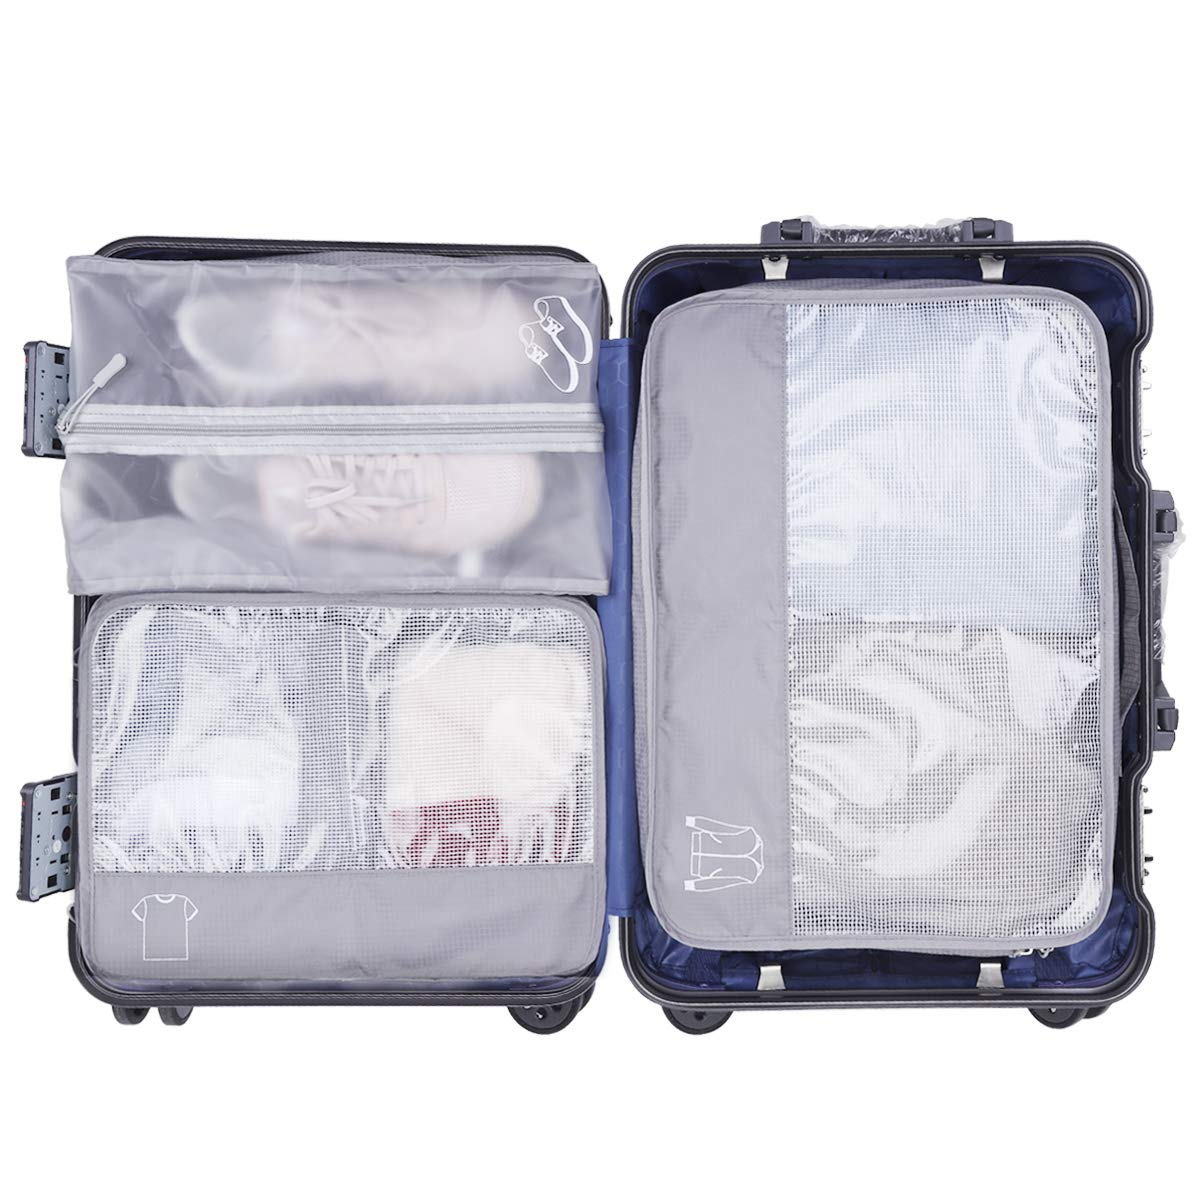 Organizador de Equipaje Impermeable, 6 Set de Organizador de Viaje para Maletas con Bolsa de Almacenamiento Transpirable para Zapatos, Ropas Sucias y Cosméticos, Material Nylon